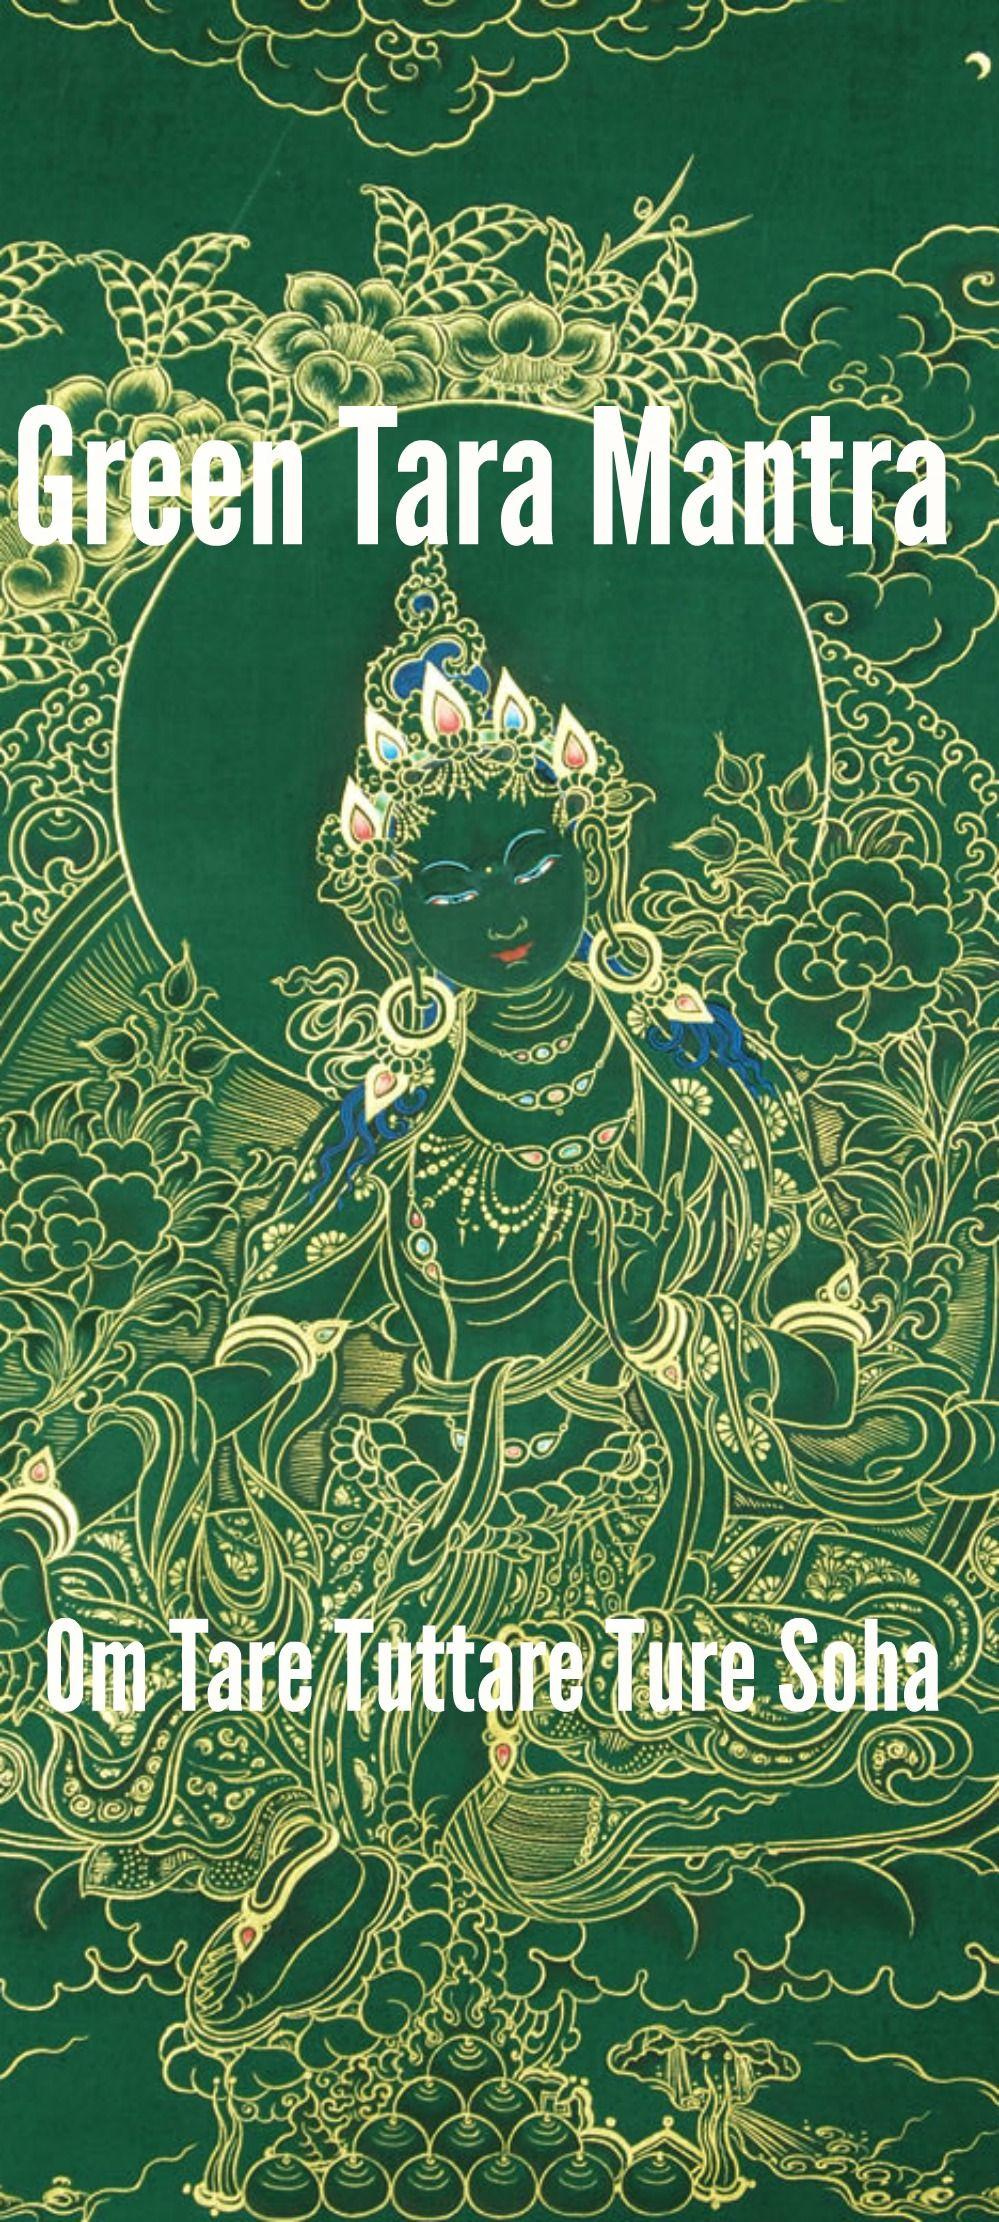 Green Tara Mantra Om Tare Tuttare Ture Soha Translation